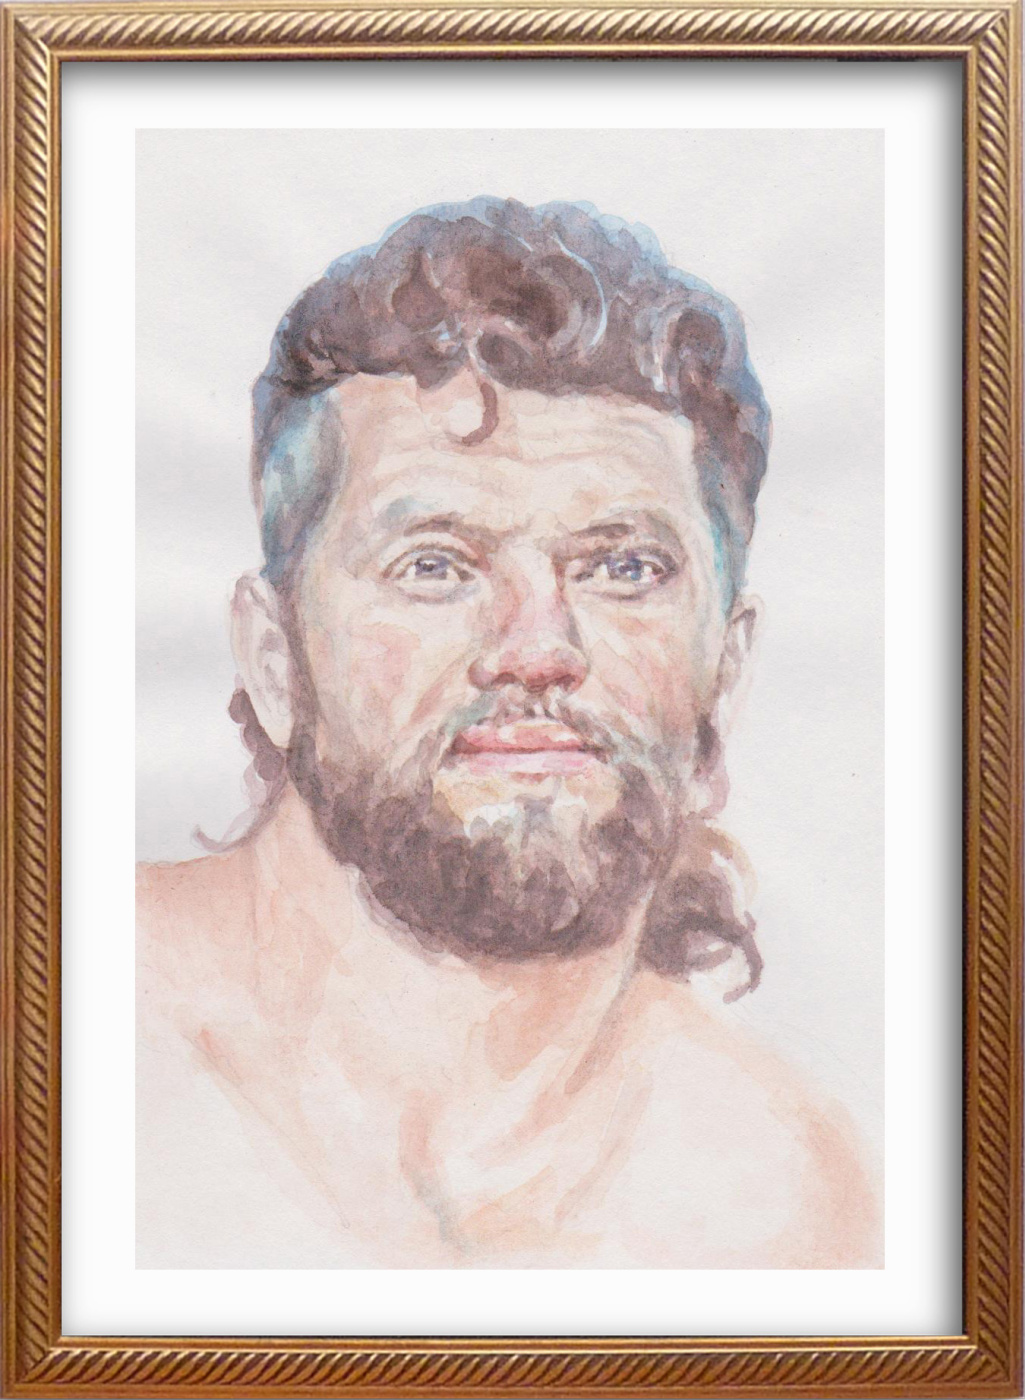 Ivan Alexandrovich Dolgorukov. My watercolor portrait of the artist Alexander Ankudinov